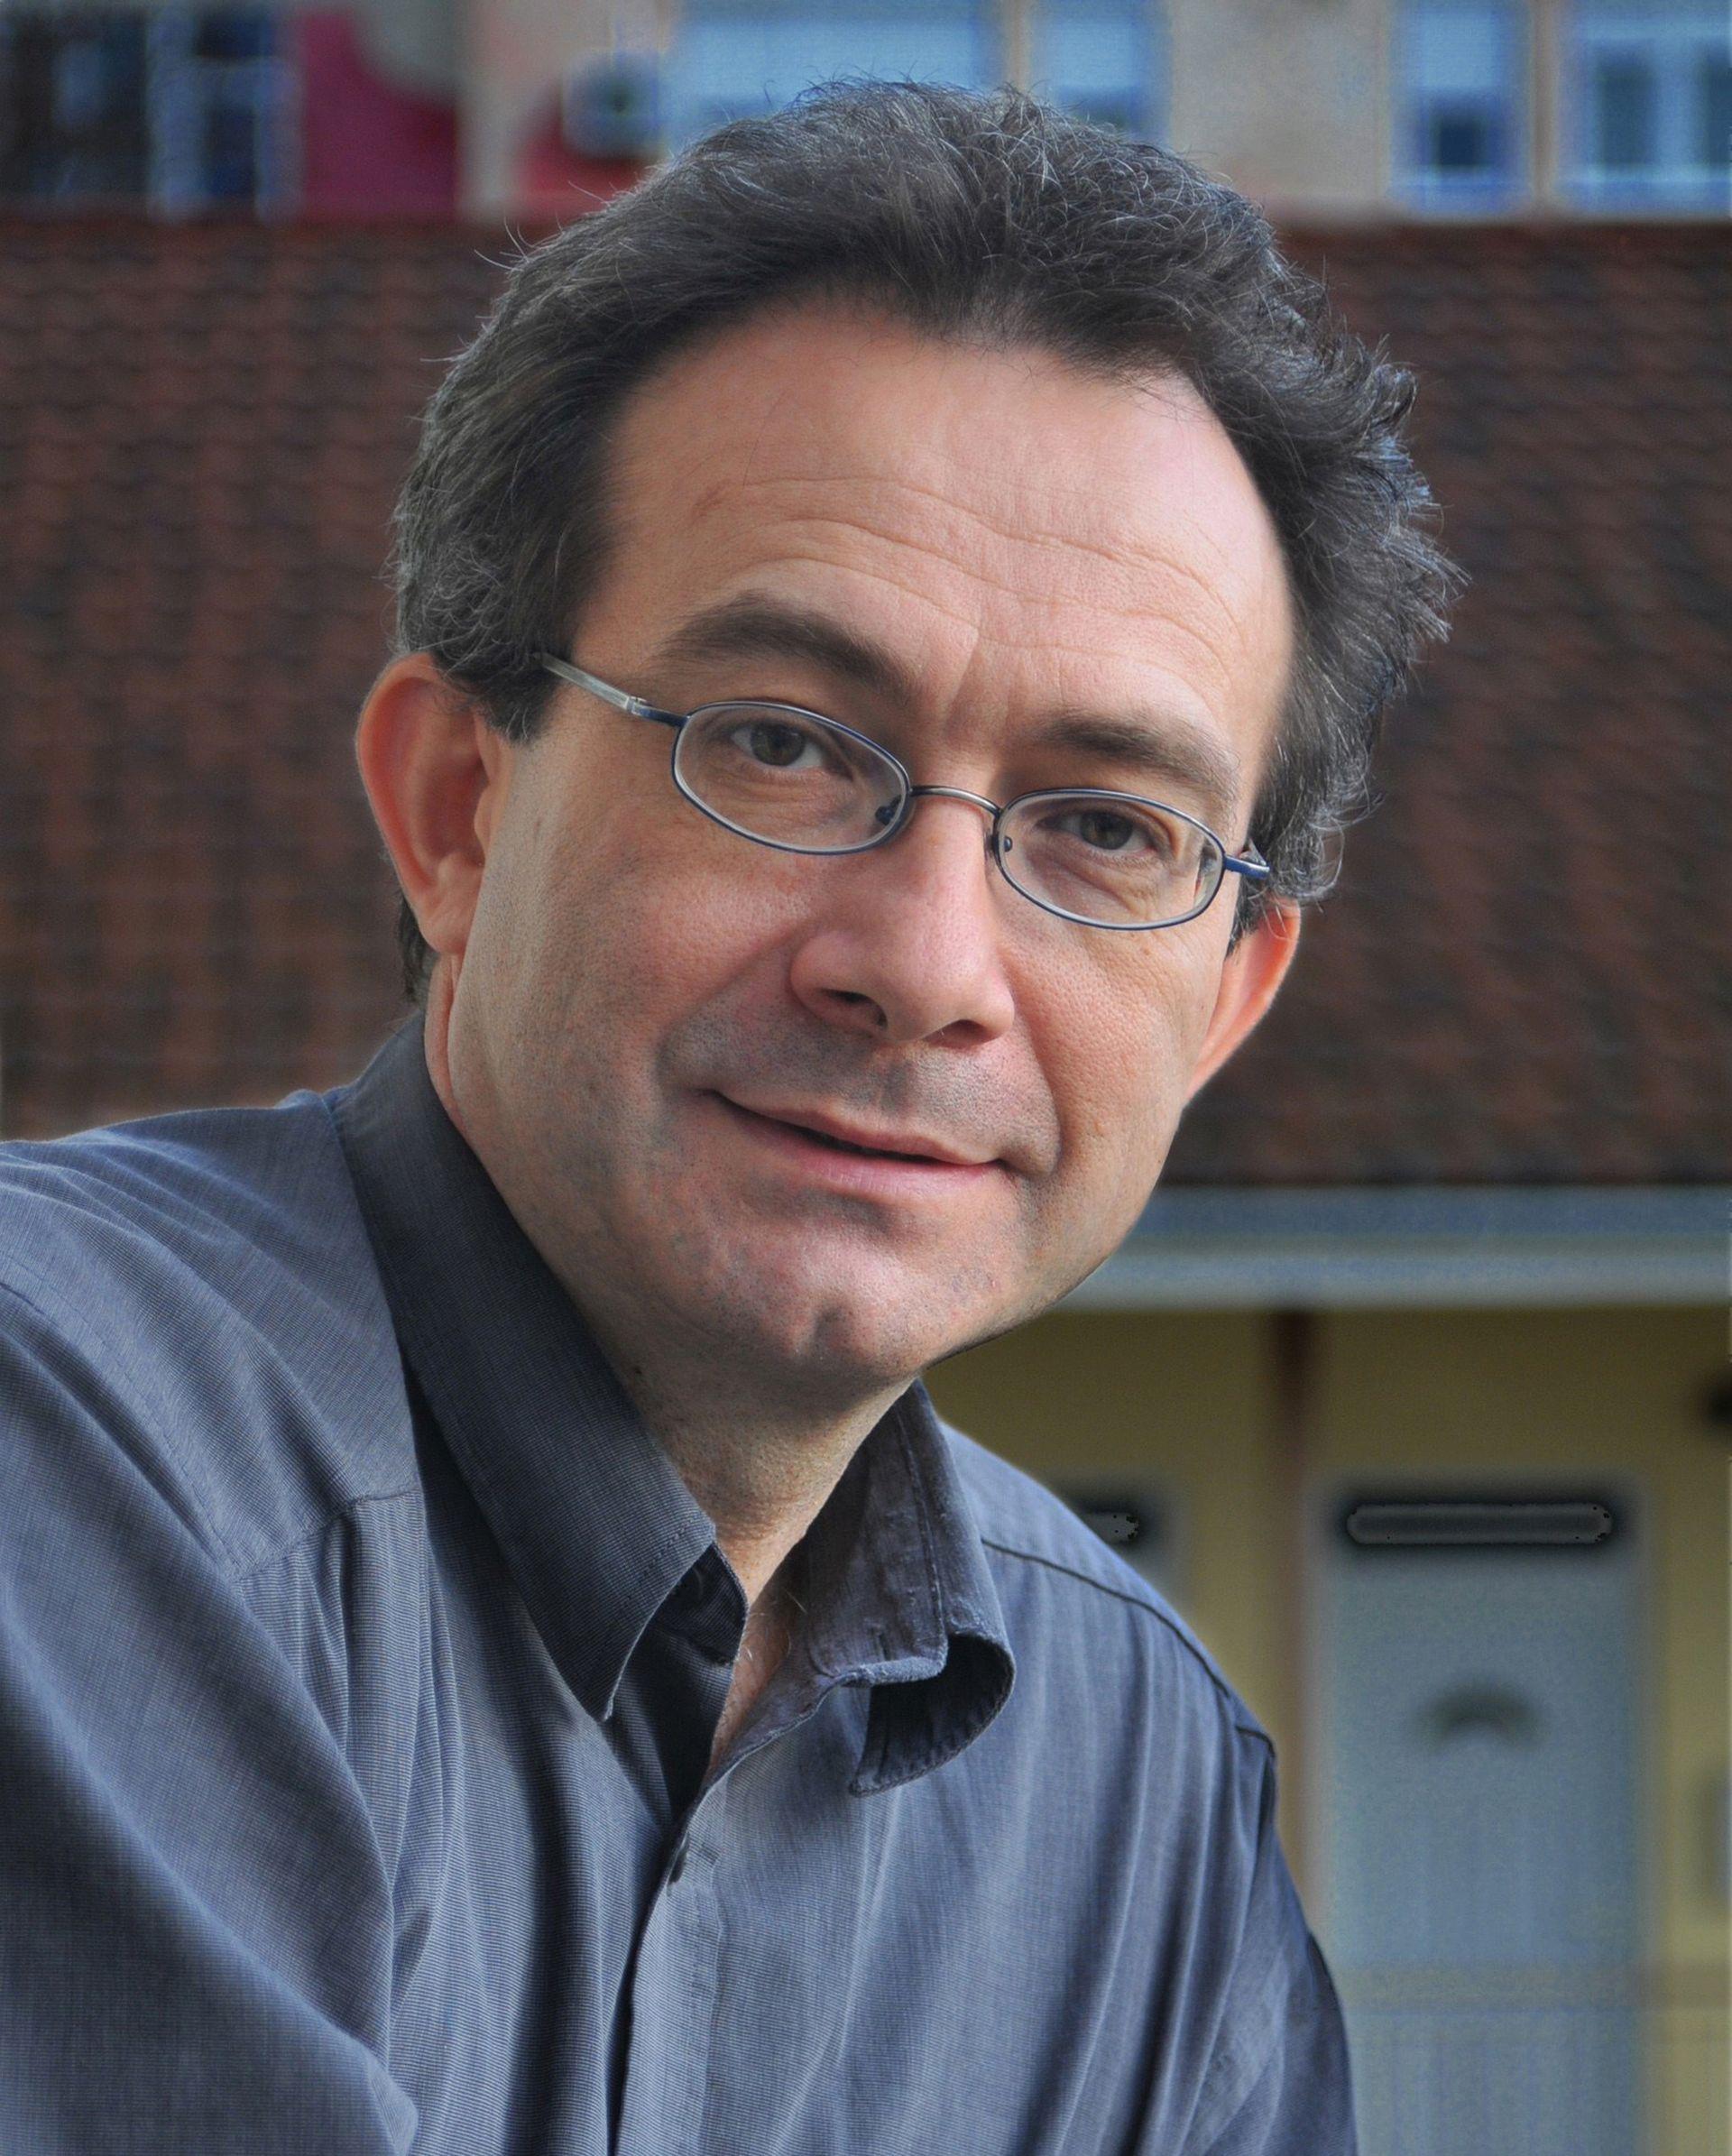 Istaknuti mađarski književnik Szilard Borbely dostupan na hrvatskome